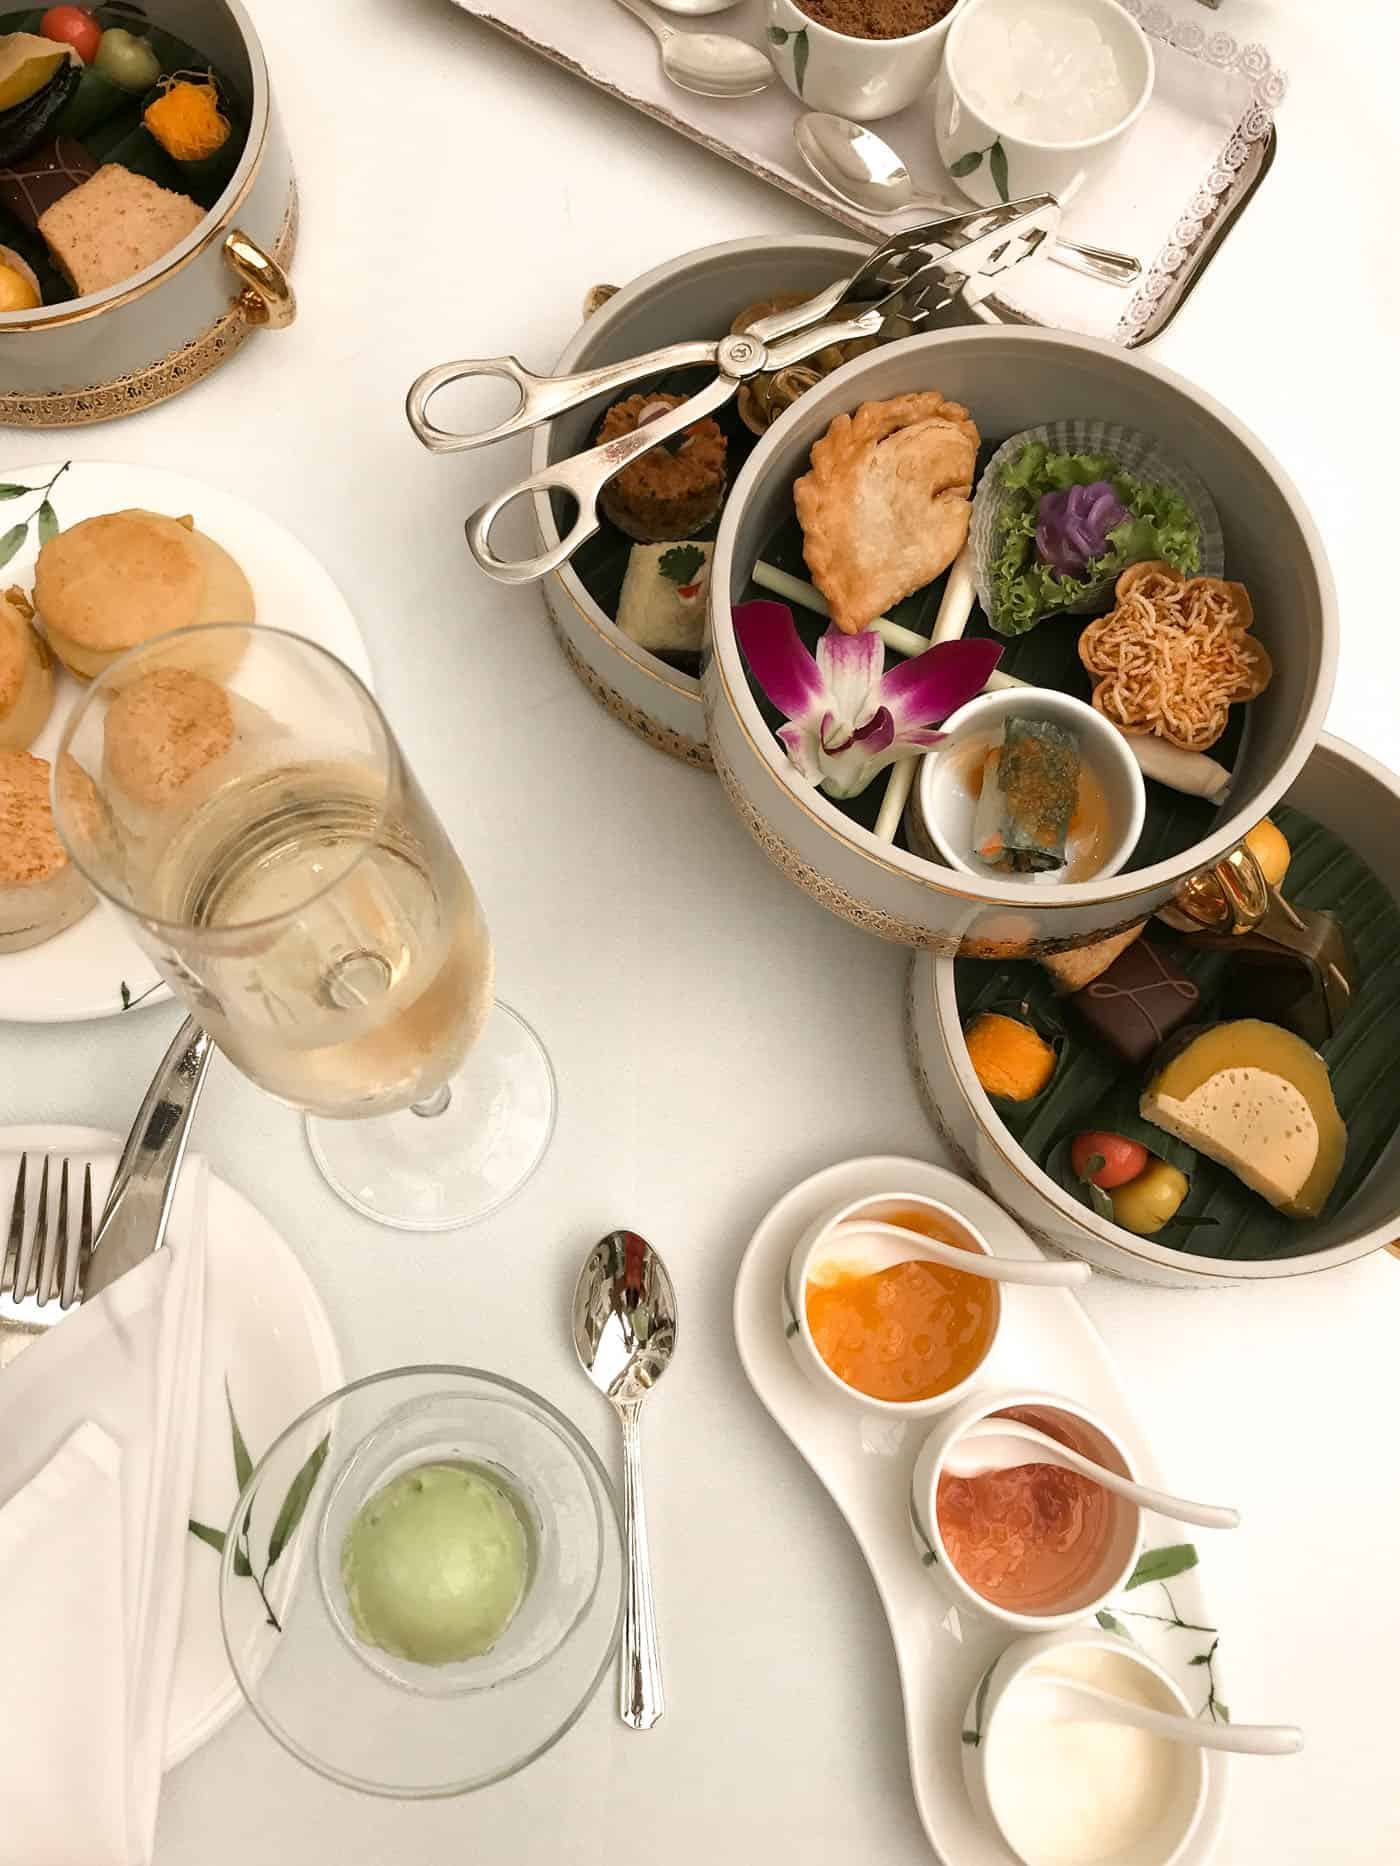 things to do in thailand - Oriental high tea - My Style Vita @mystylevita